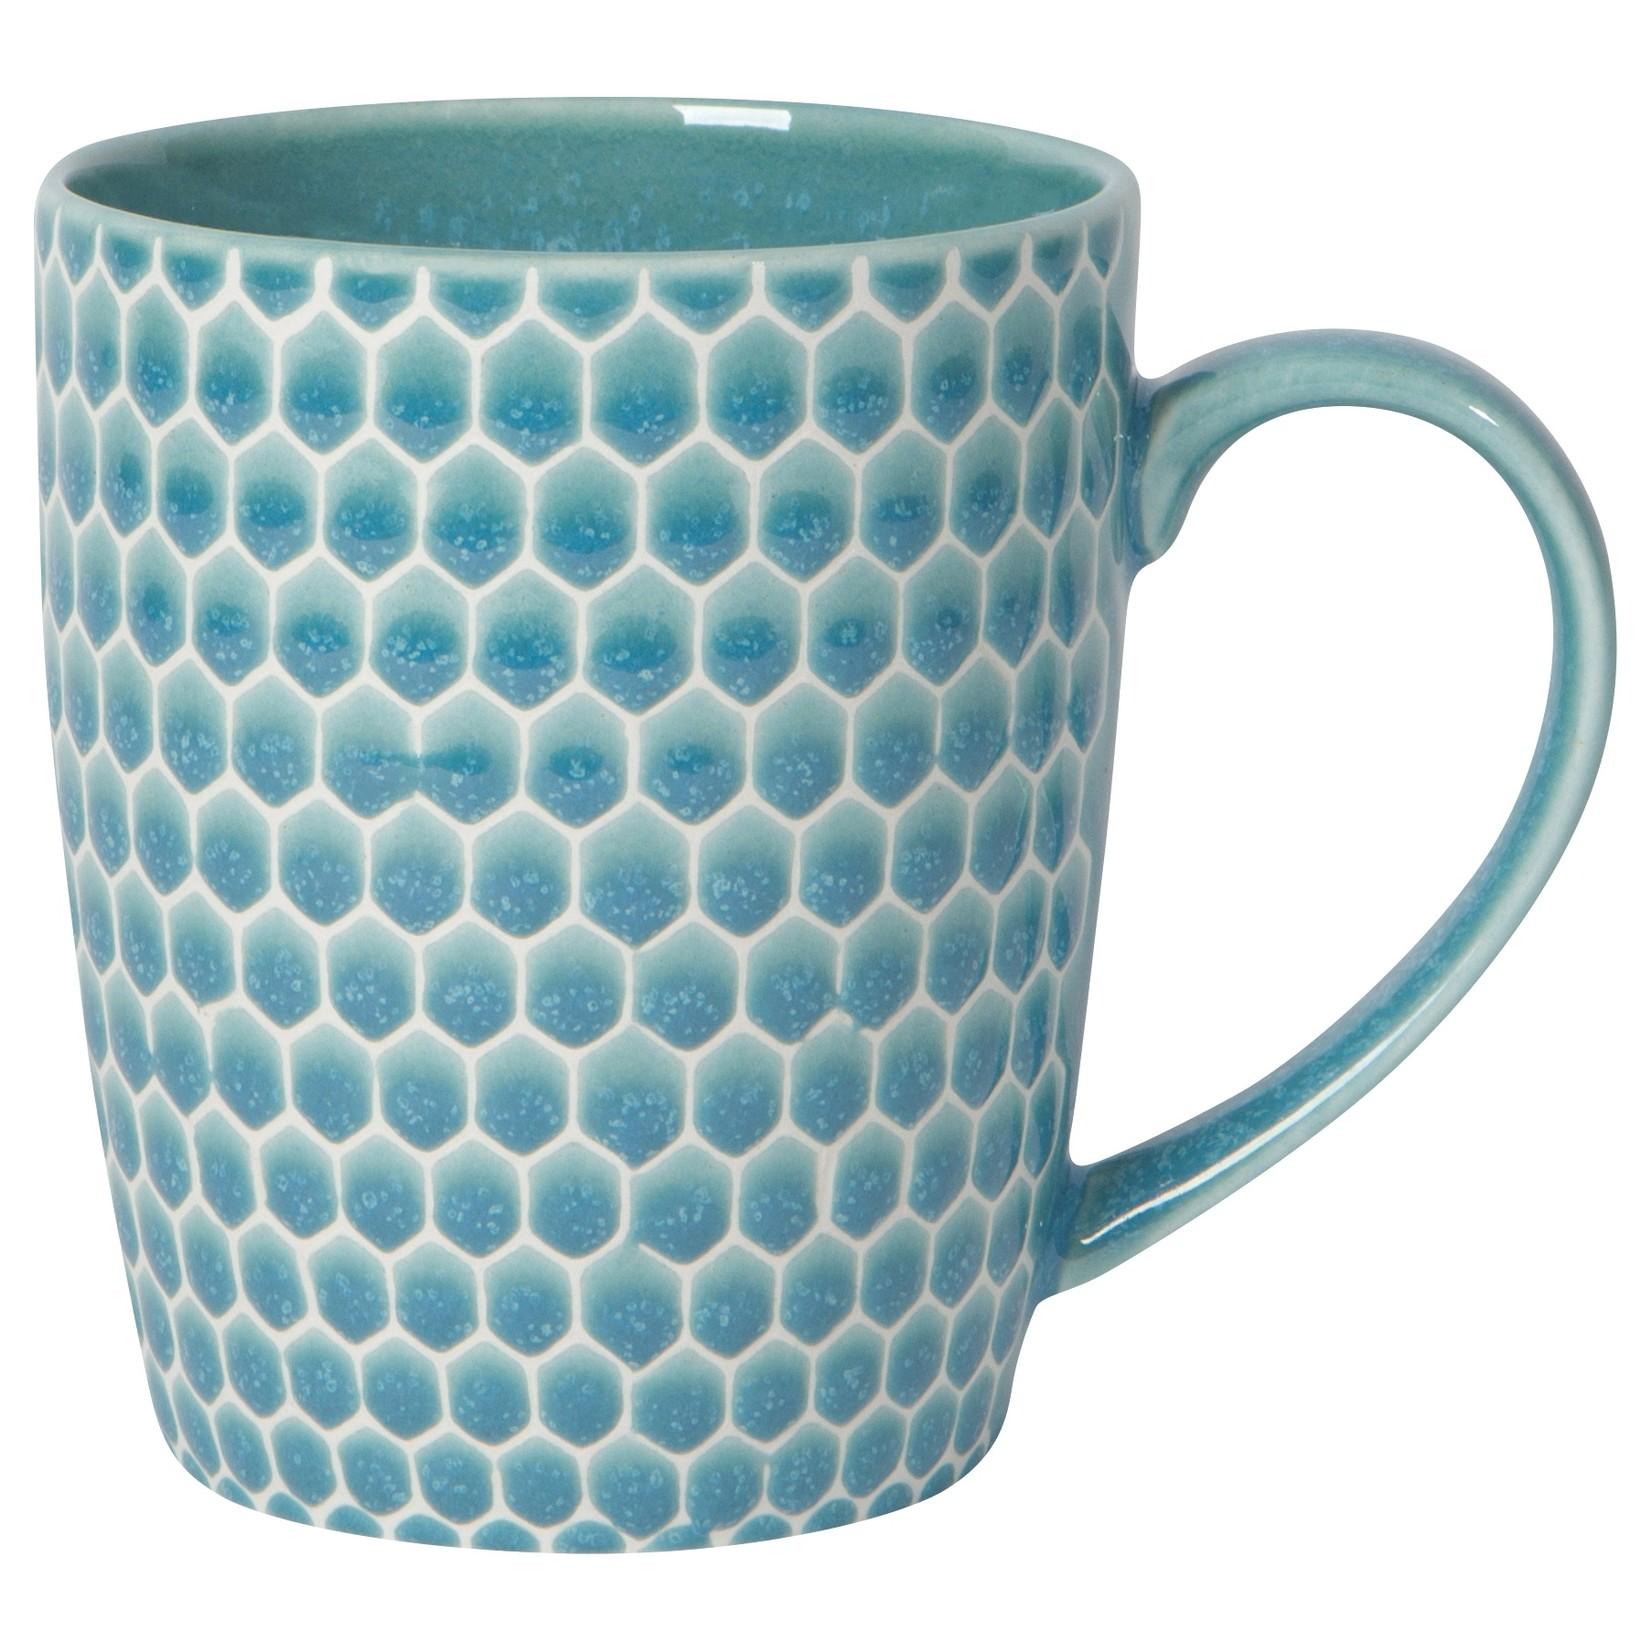 Heirloom Honeycomb Mug